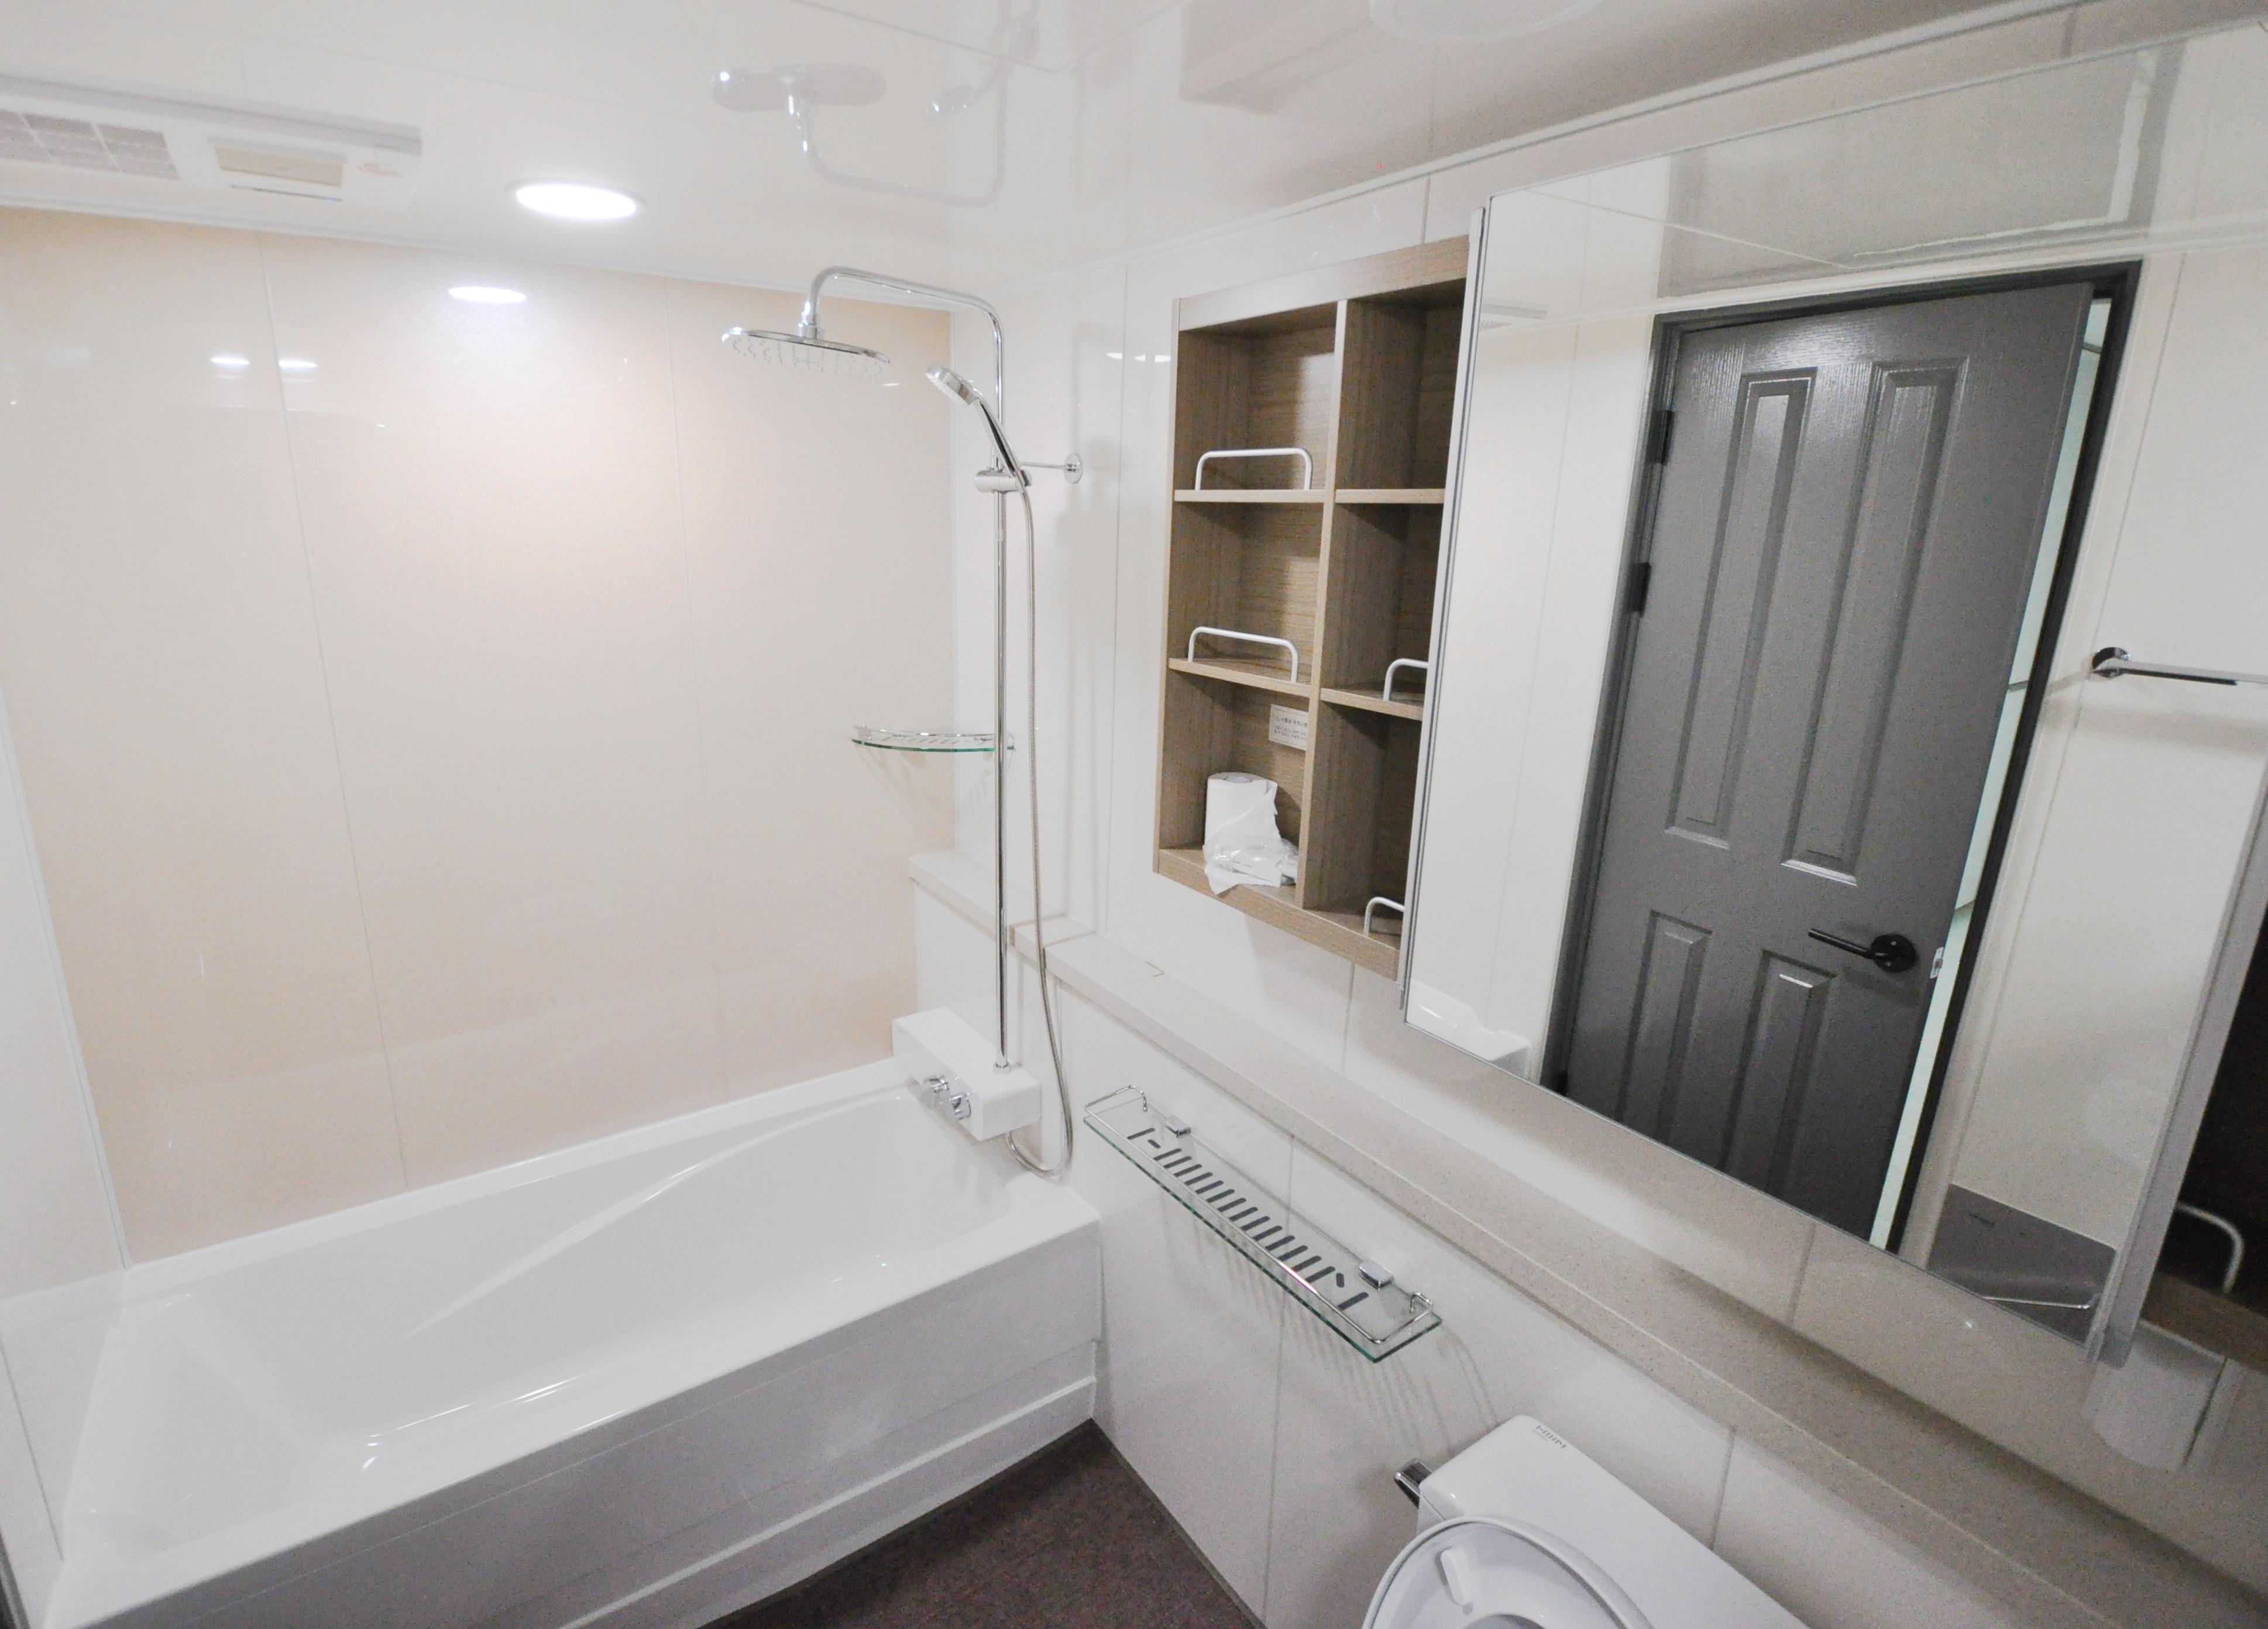 Free Images : interior, design, home, toilet 3876x2784 - - 1367617 ...